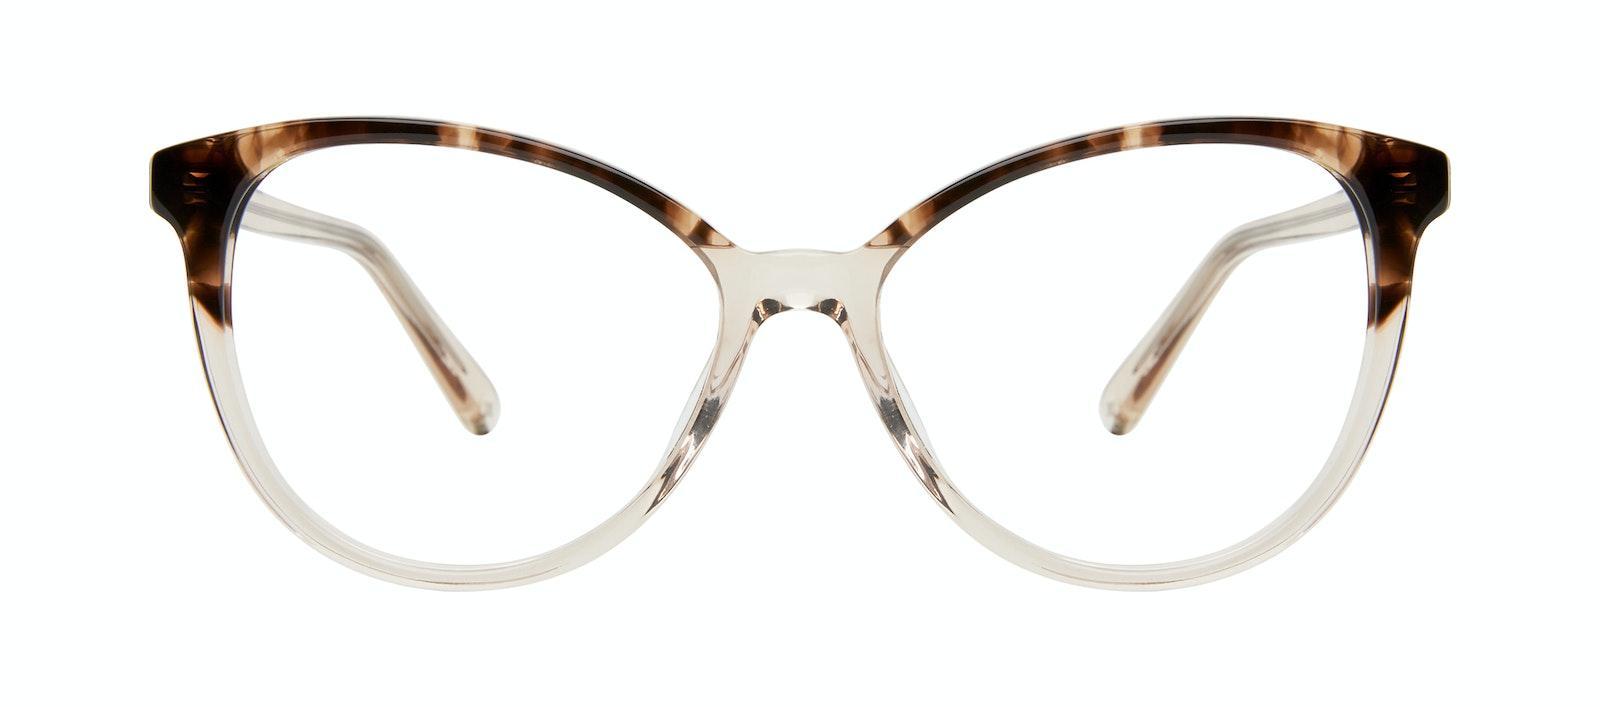 Affordable Fashion Glasses Cat Eye Eyeglasses Women Esprit L Golden Tortoise Front